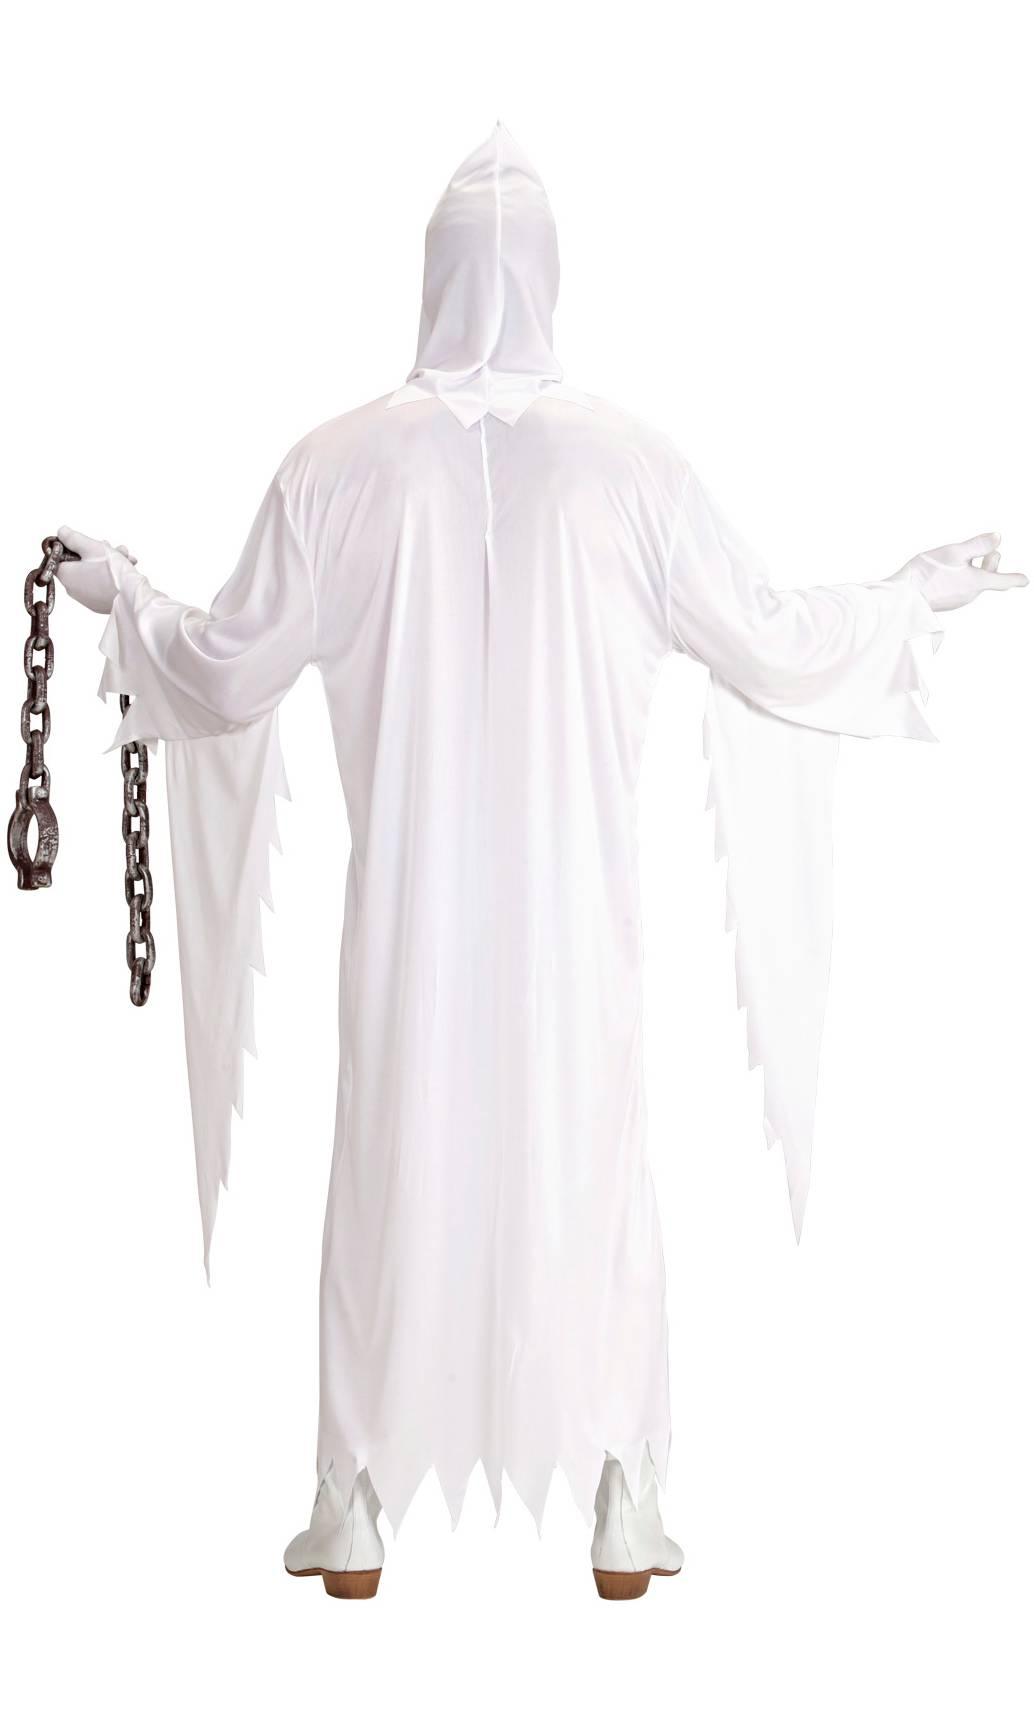 Costume-Fantôme-2